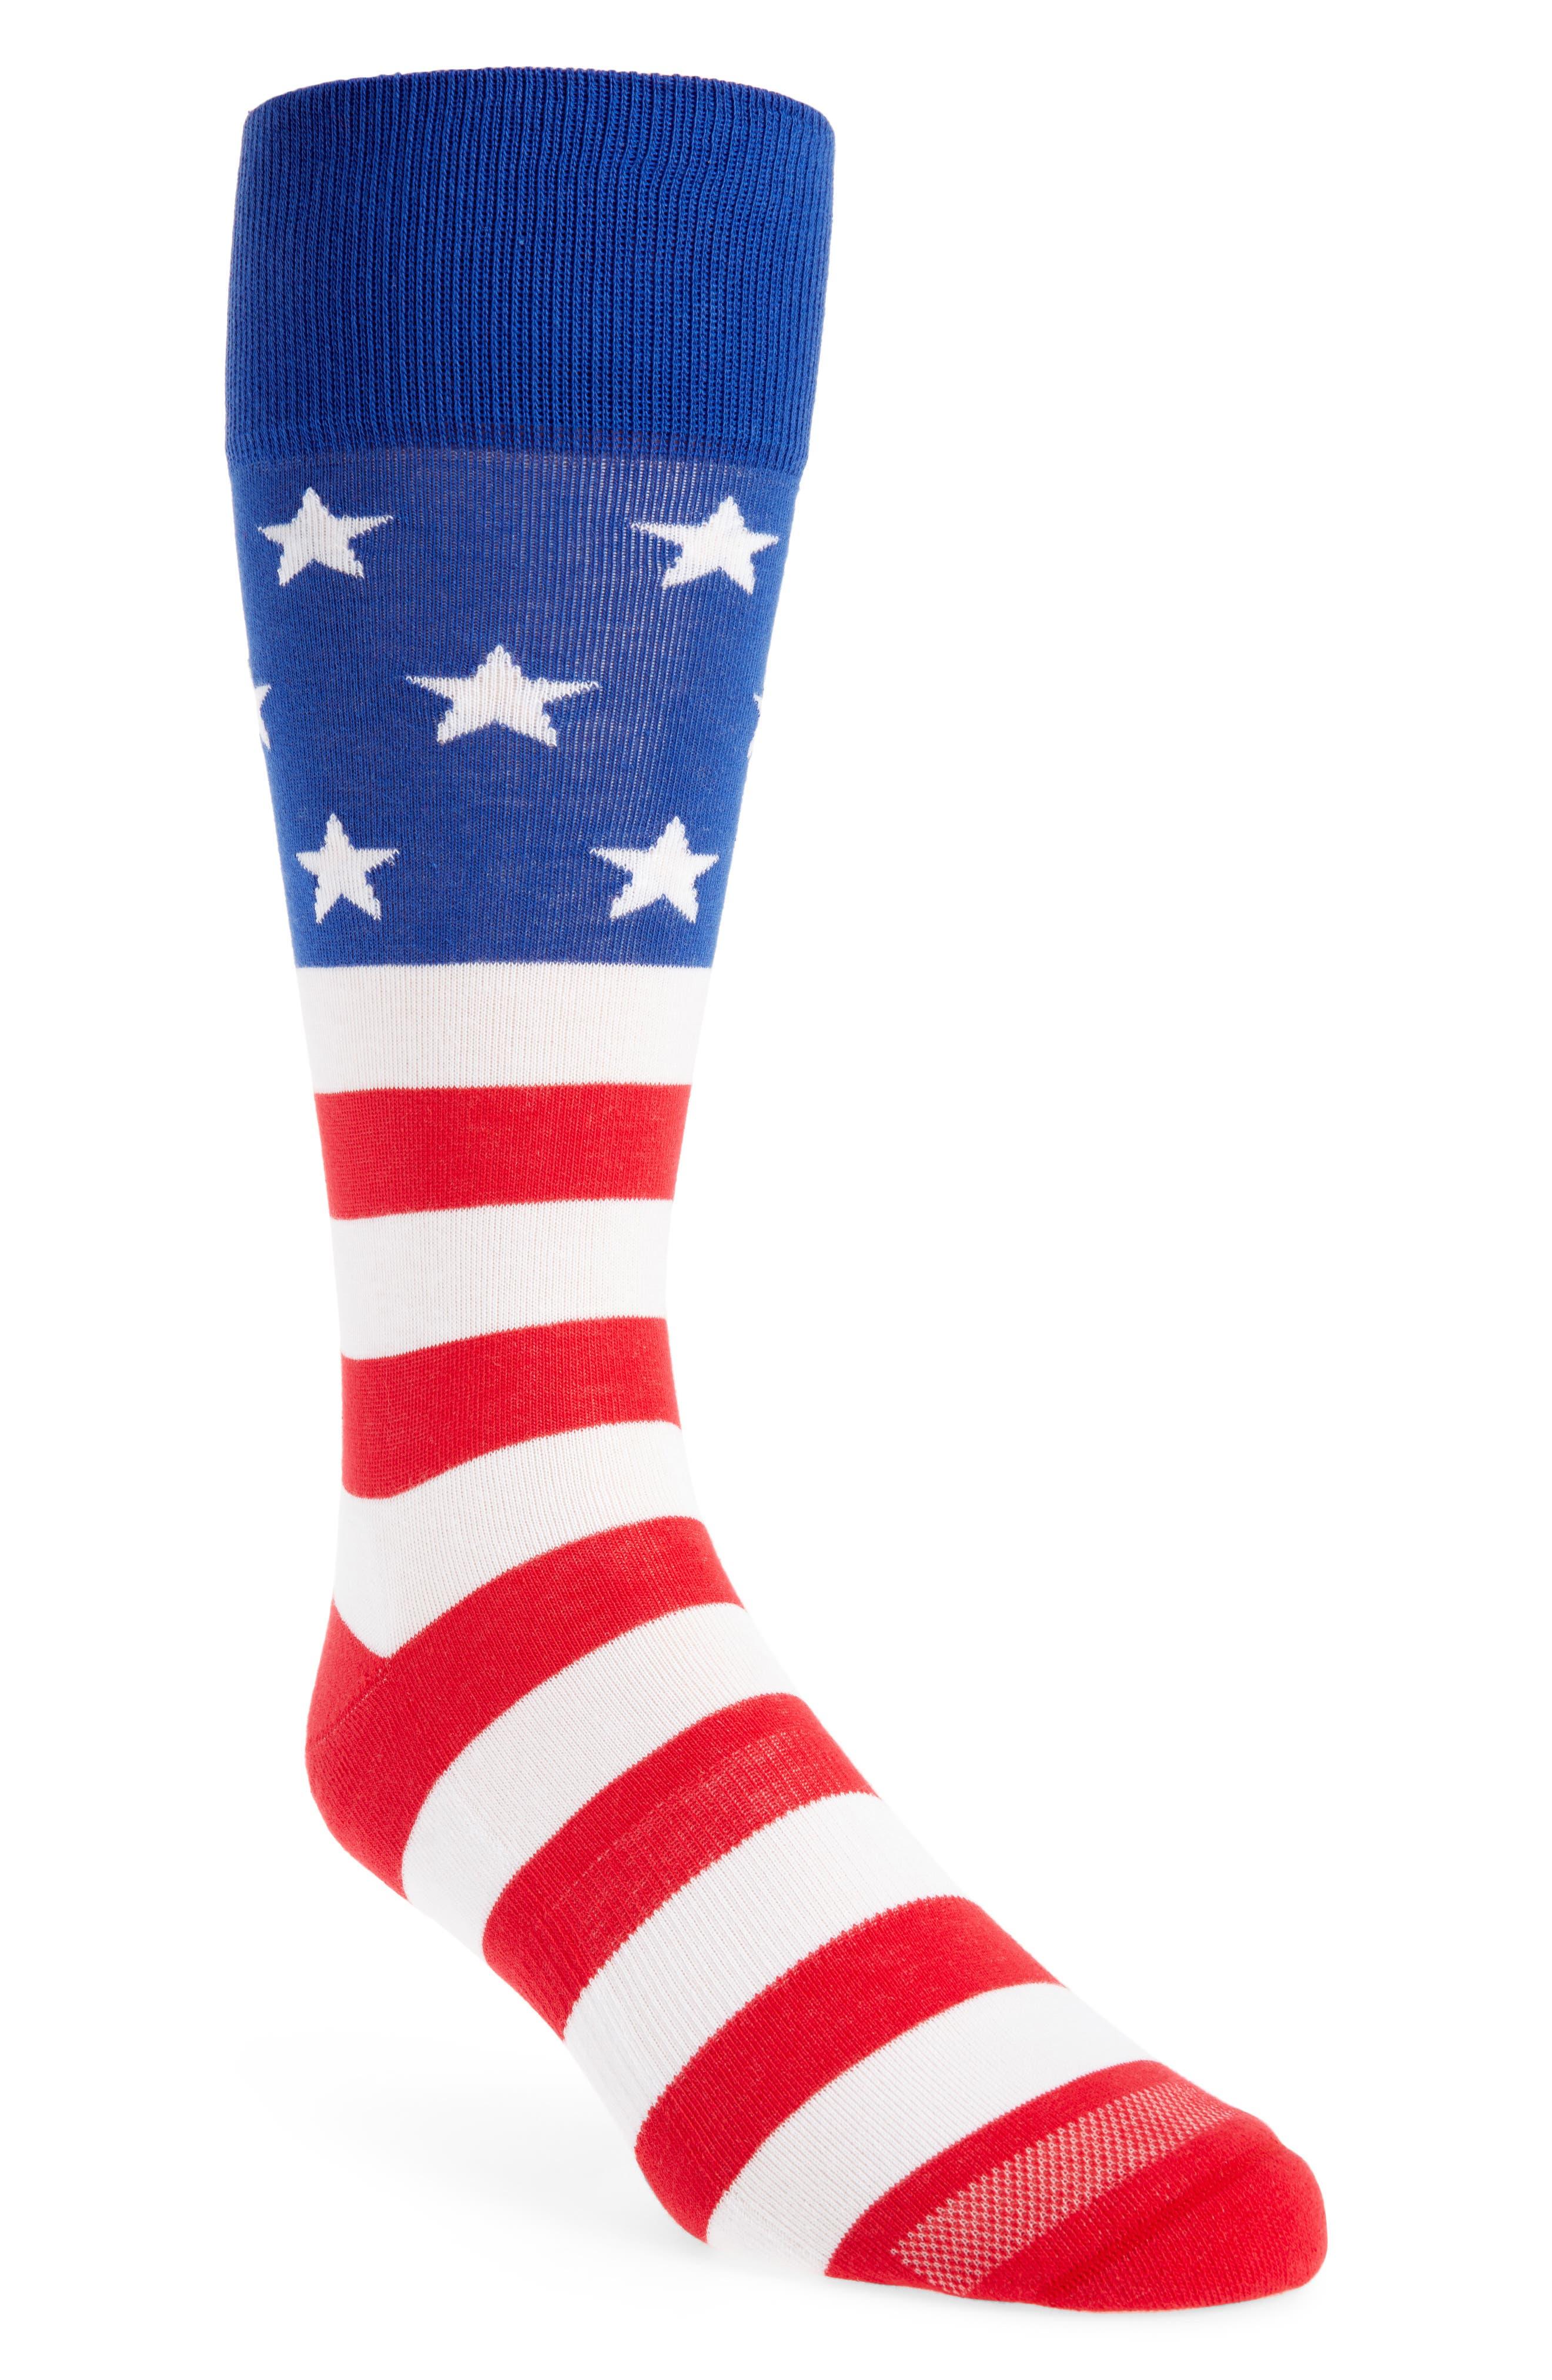 American Flag Socks,                             Main thumbnail 1, color,                             RED/ WHITE/ BLUE